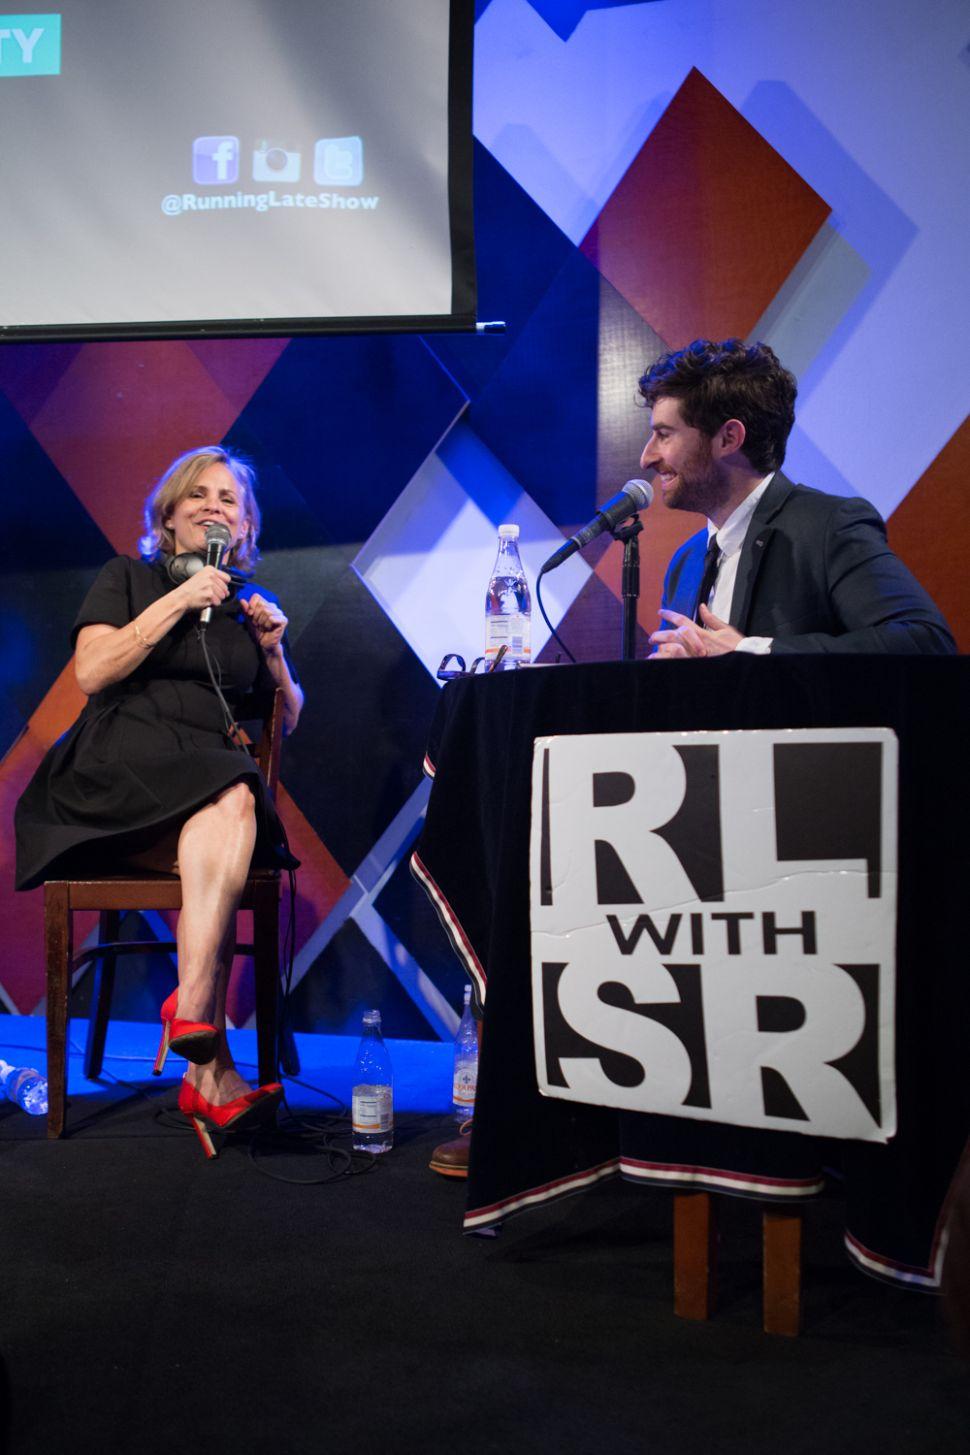 With Dad as Sidekick, Talk Show Host Scott Rogowsky Kibitzes With Comedy Icons